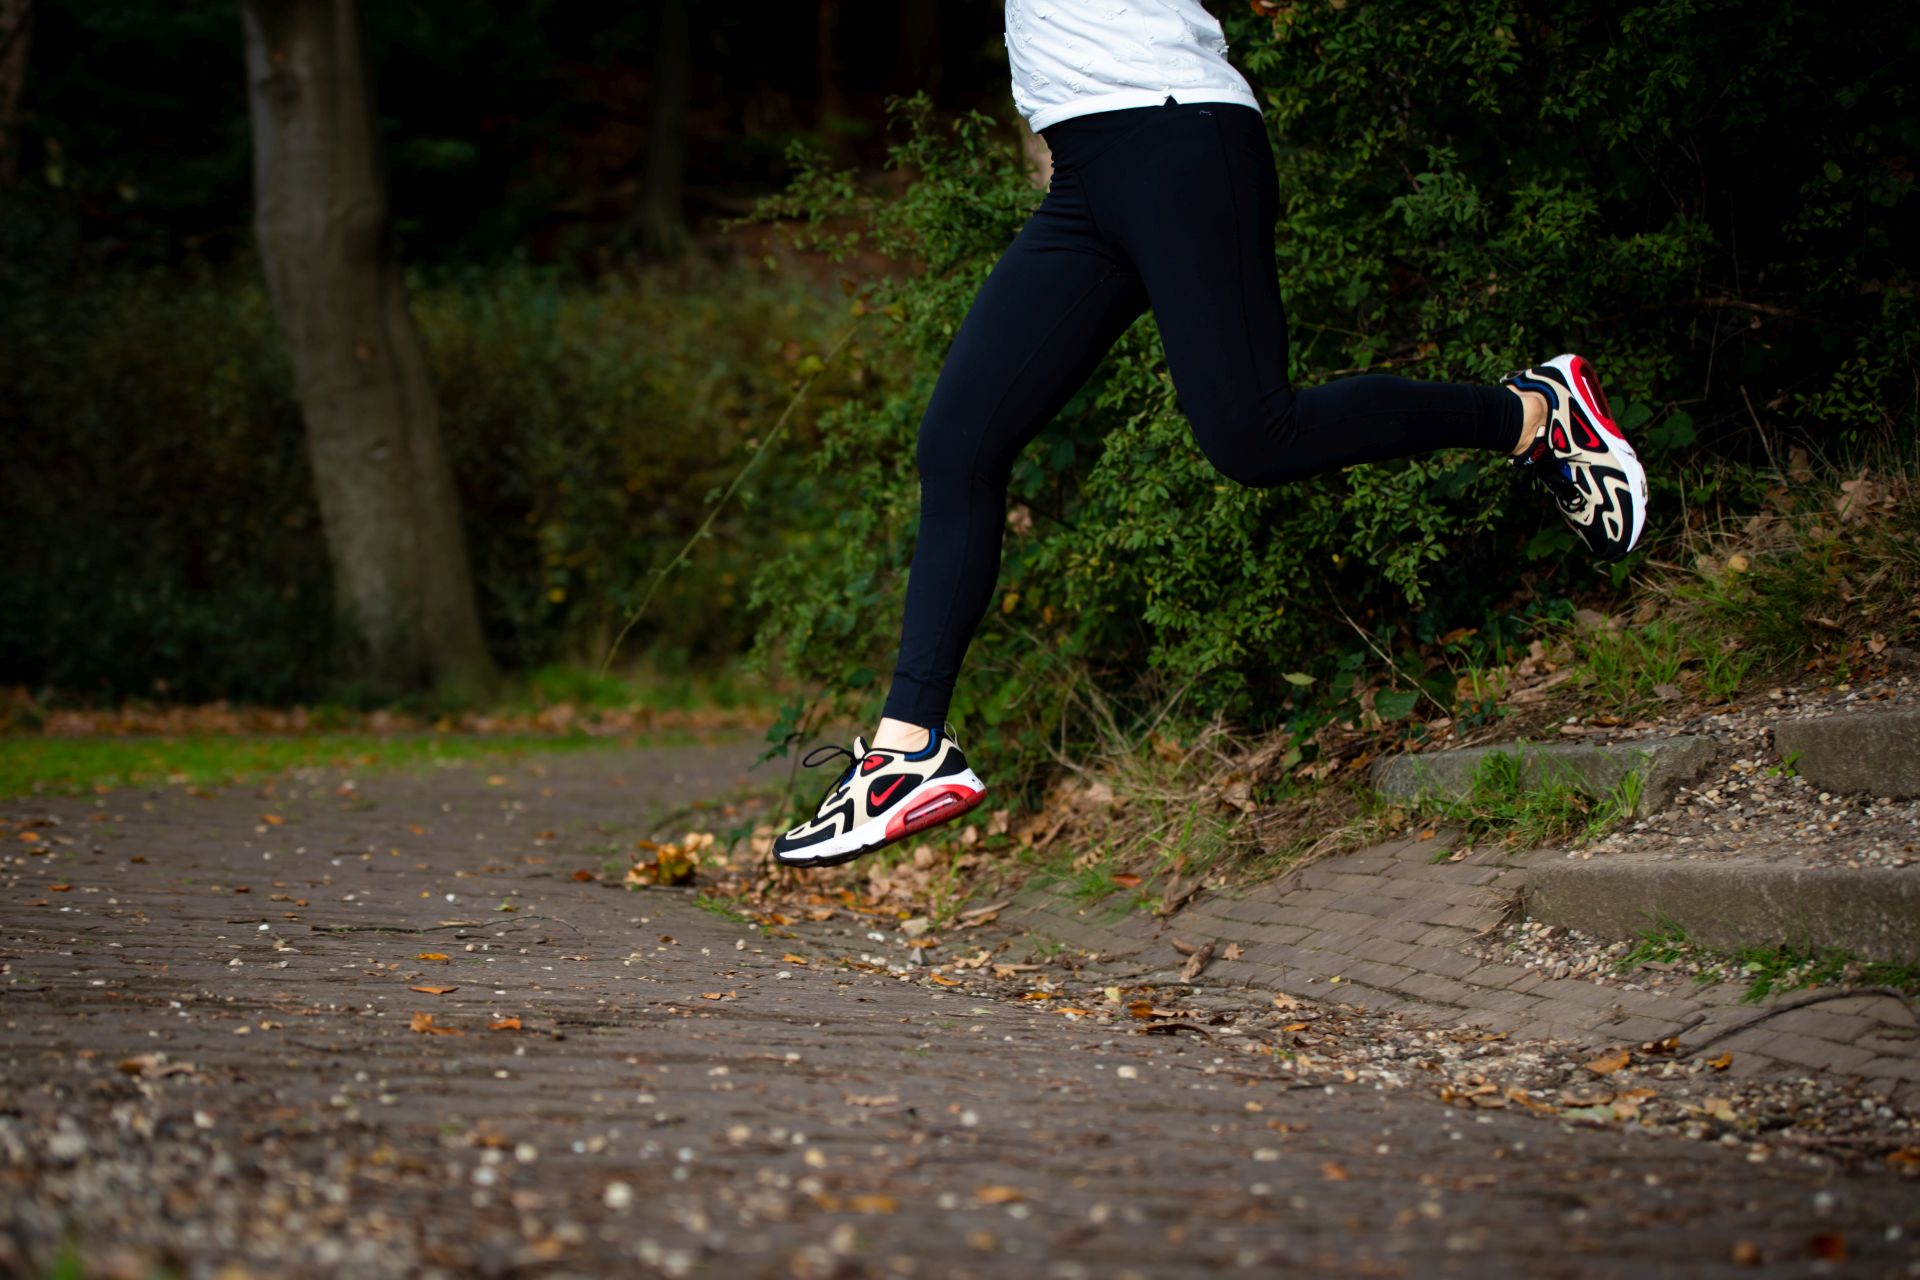 weg-met-die-rugpijn - Leefstijlcoach-Wageningen-Ede-Bennekom-yoga-coaching-personal-training_DSC_1554